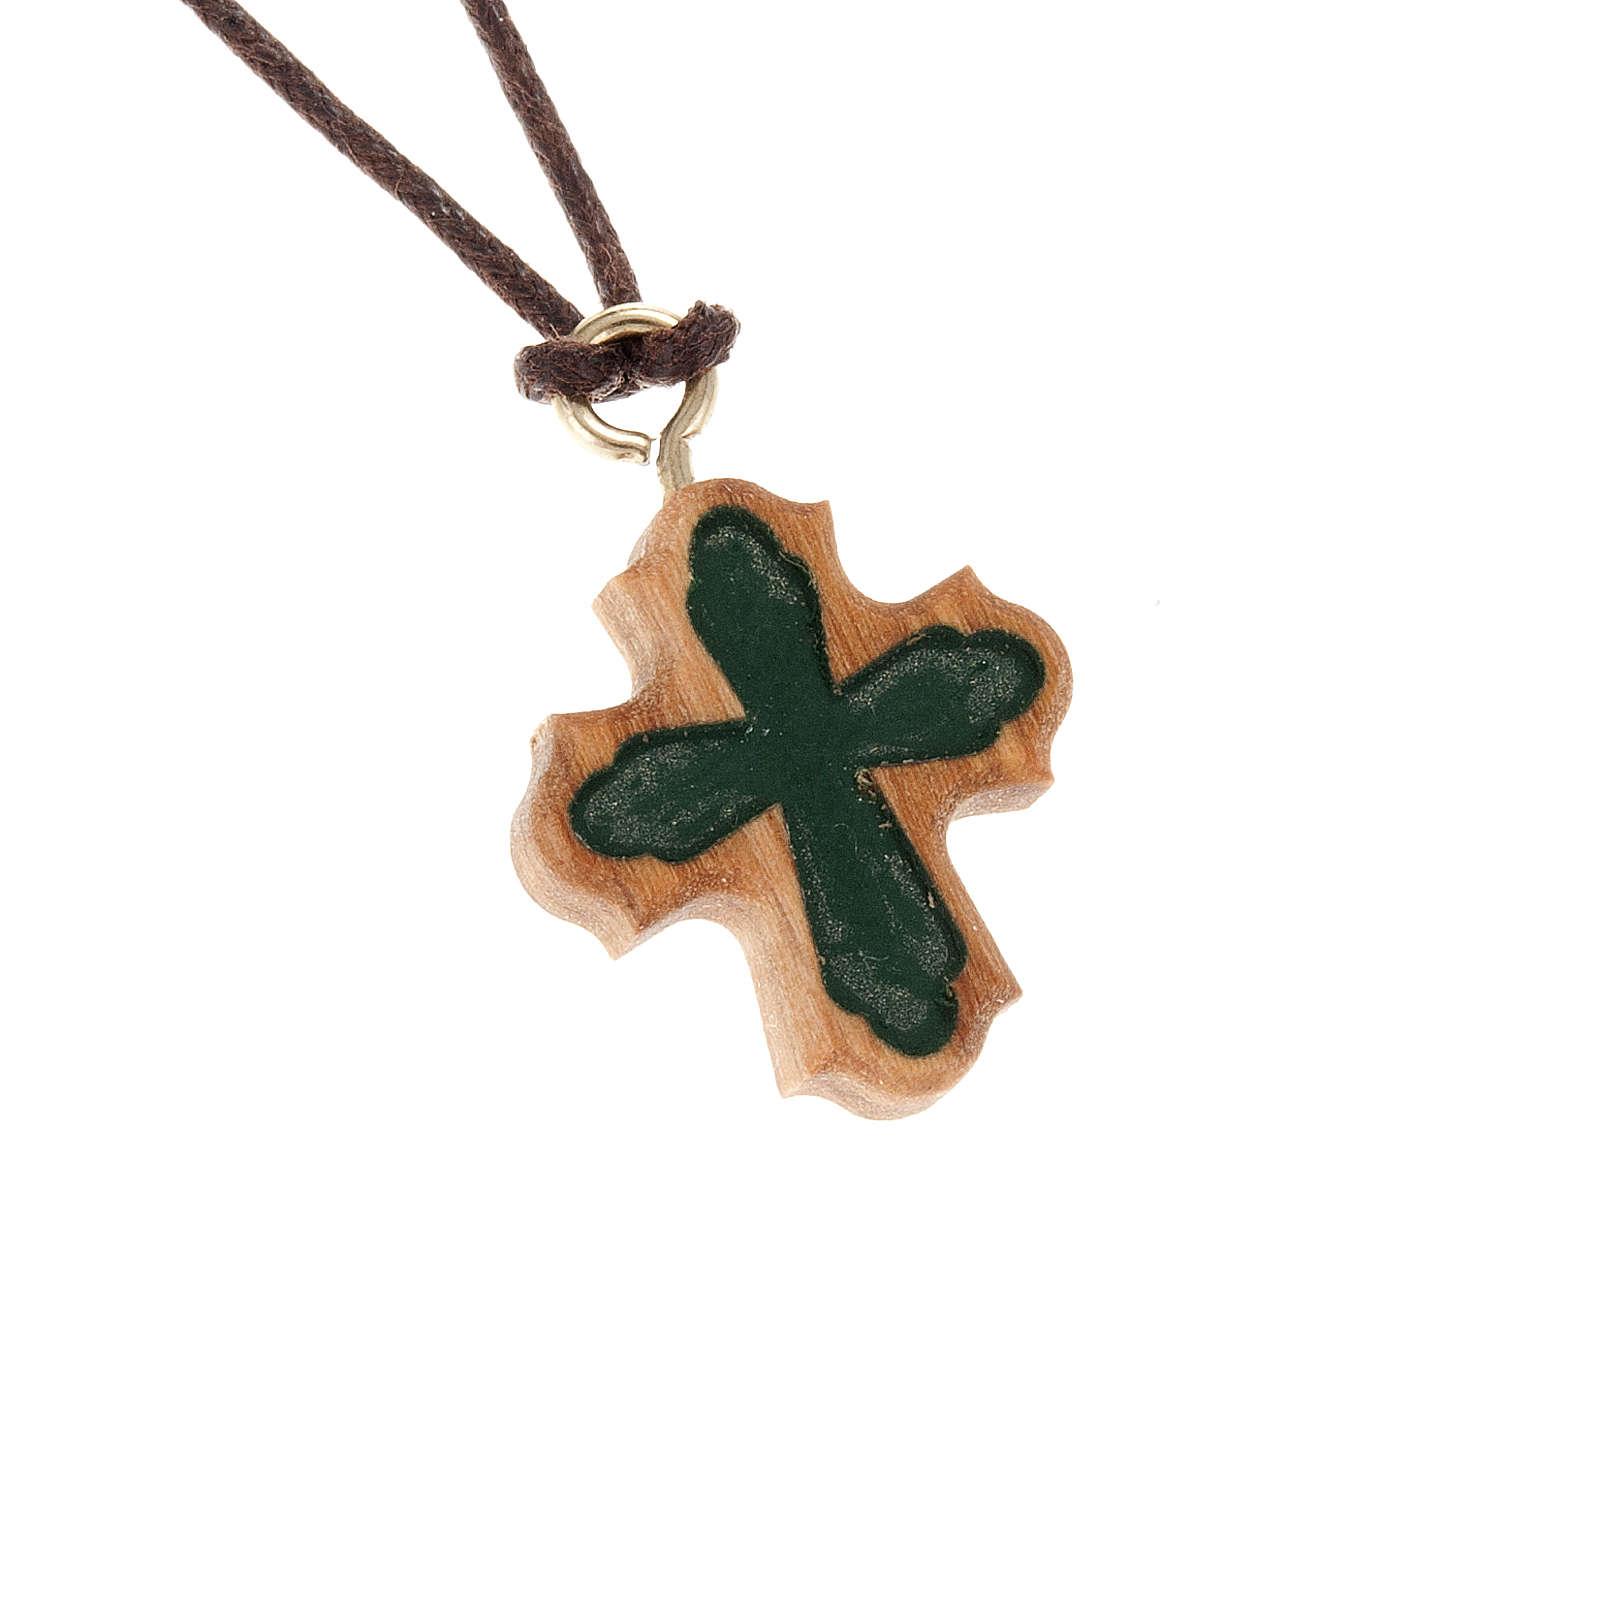 Croce olivo gotica incisa verde 4